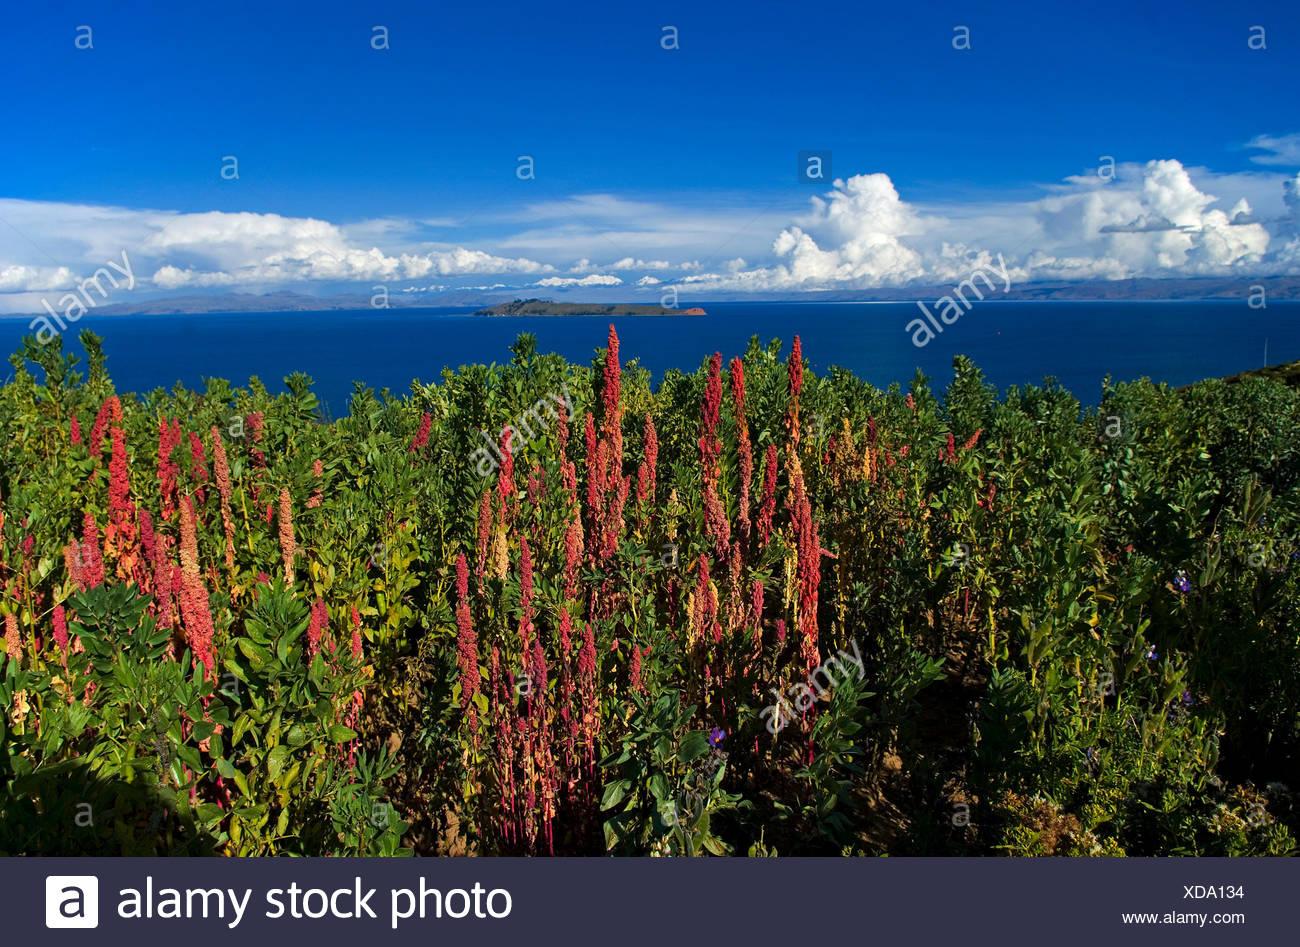 south america peru bolivia firmament sky salt water sea ocean water scenery - Stock Image